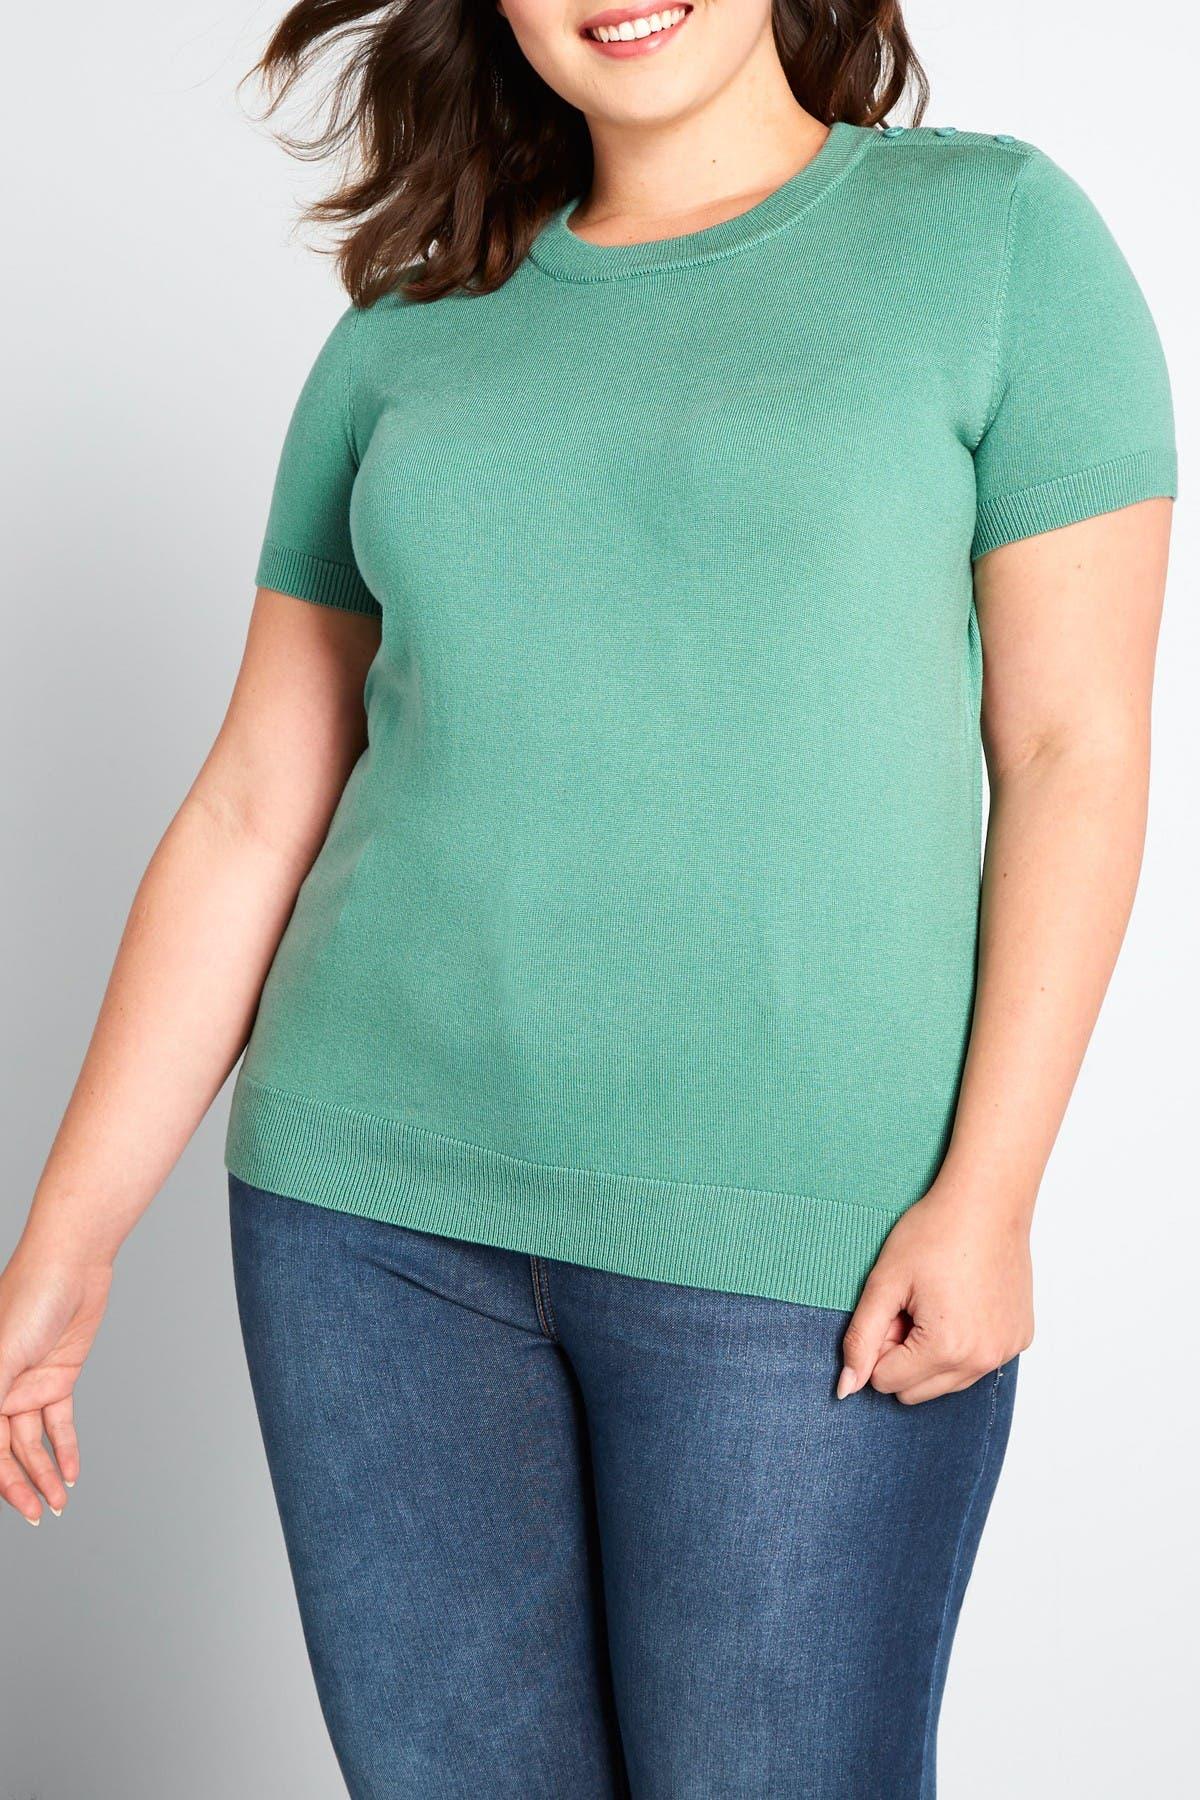 50s Shirts & Tops MODCLOTH Crew Neck T-Shirt Size 4X - Sea Green at Nordstrom Rack $19.97 AT vintagedancer.com